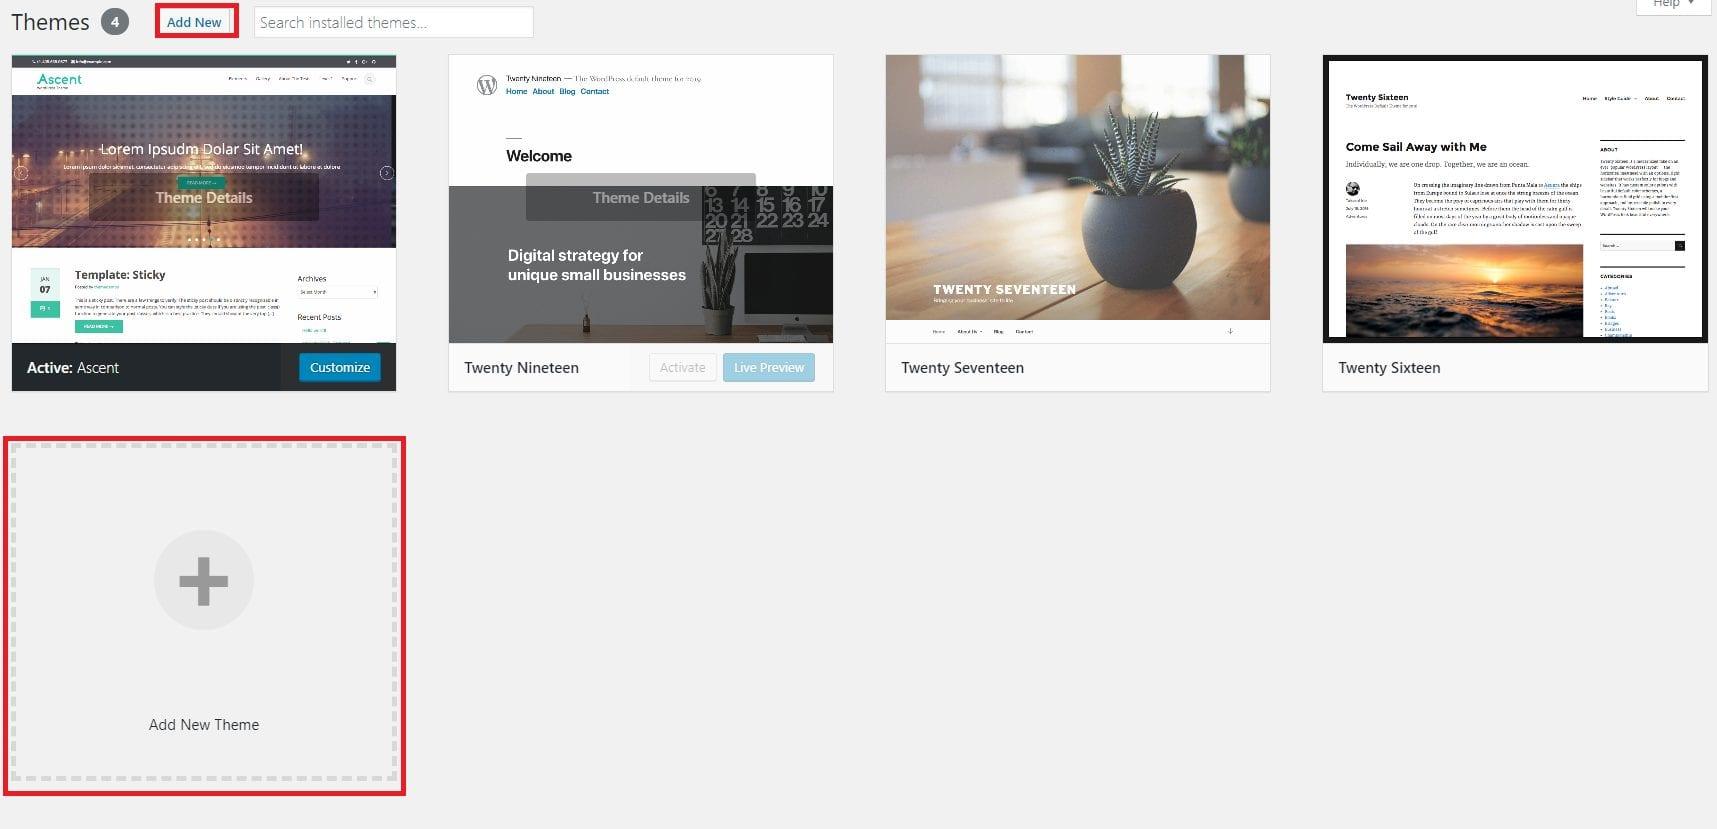 Add New Theme to WordPress